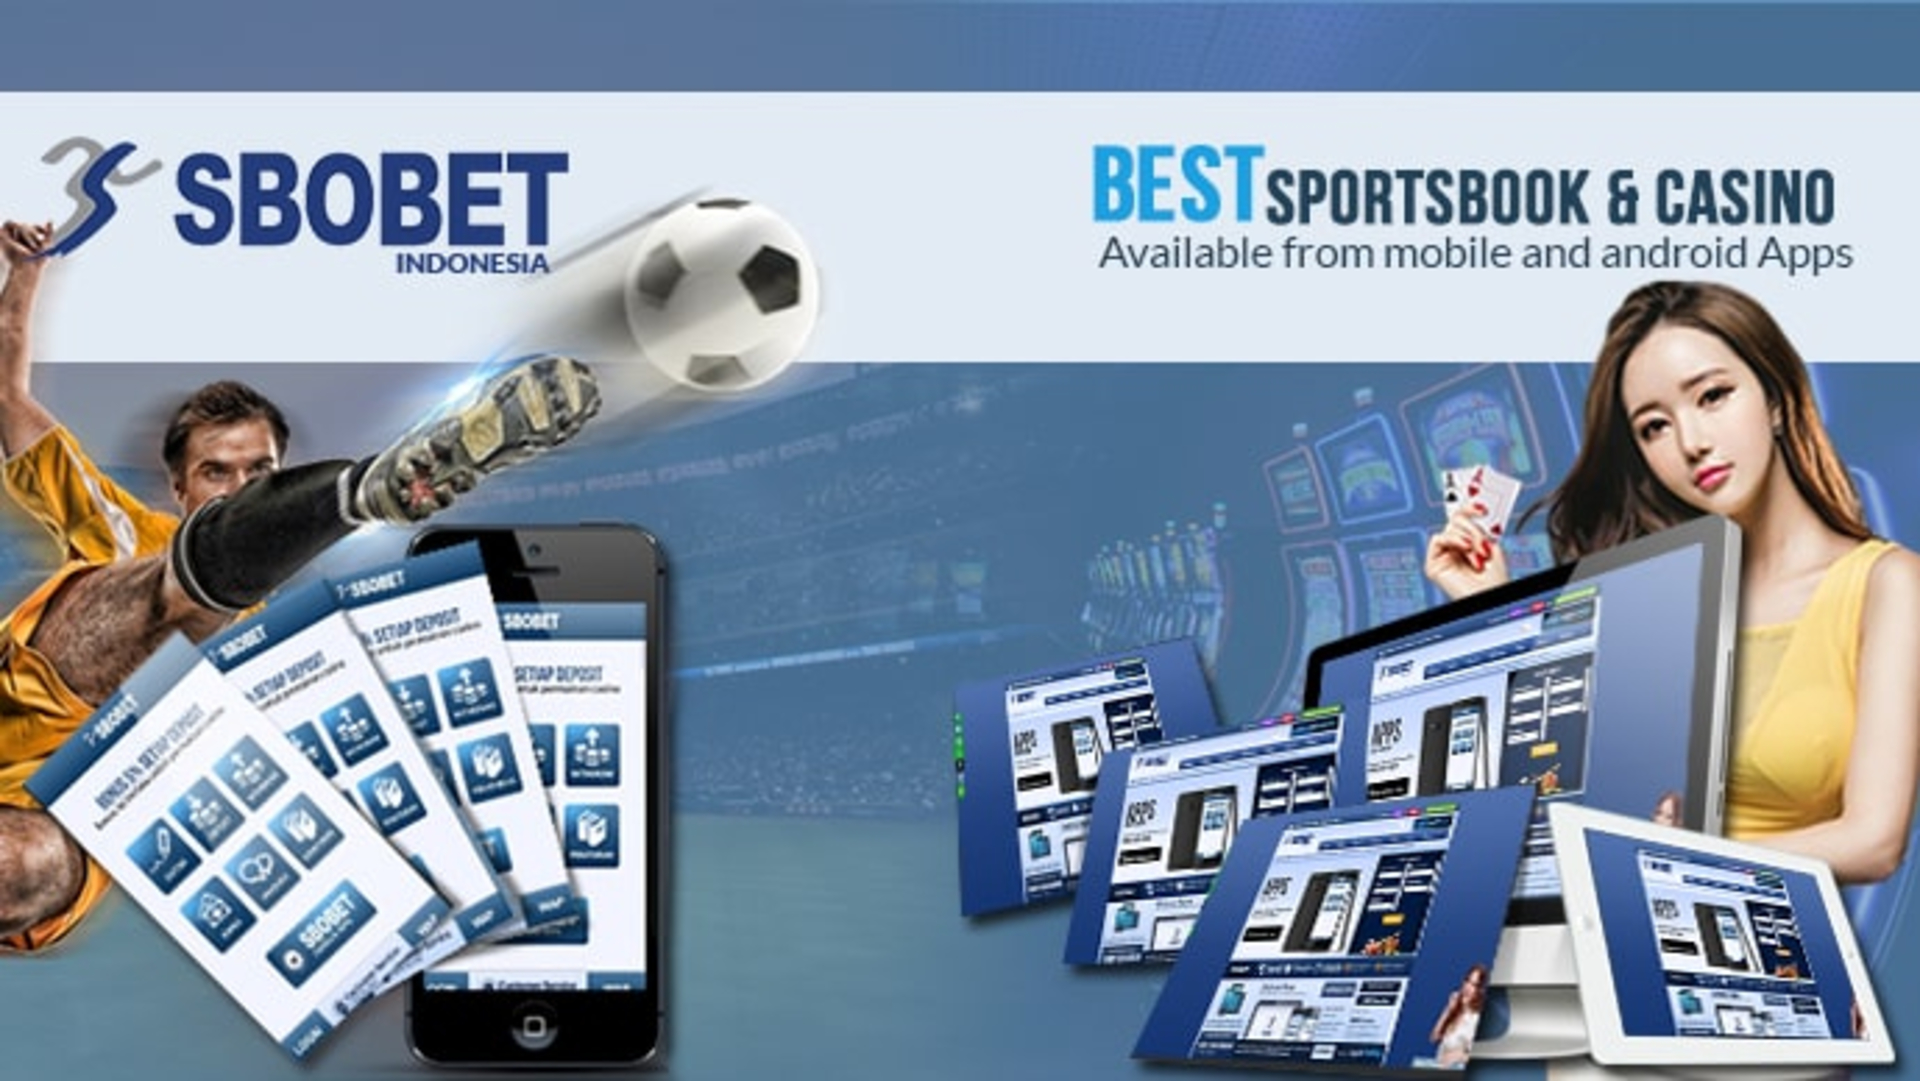 Sbobet Mobile's Edge image